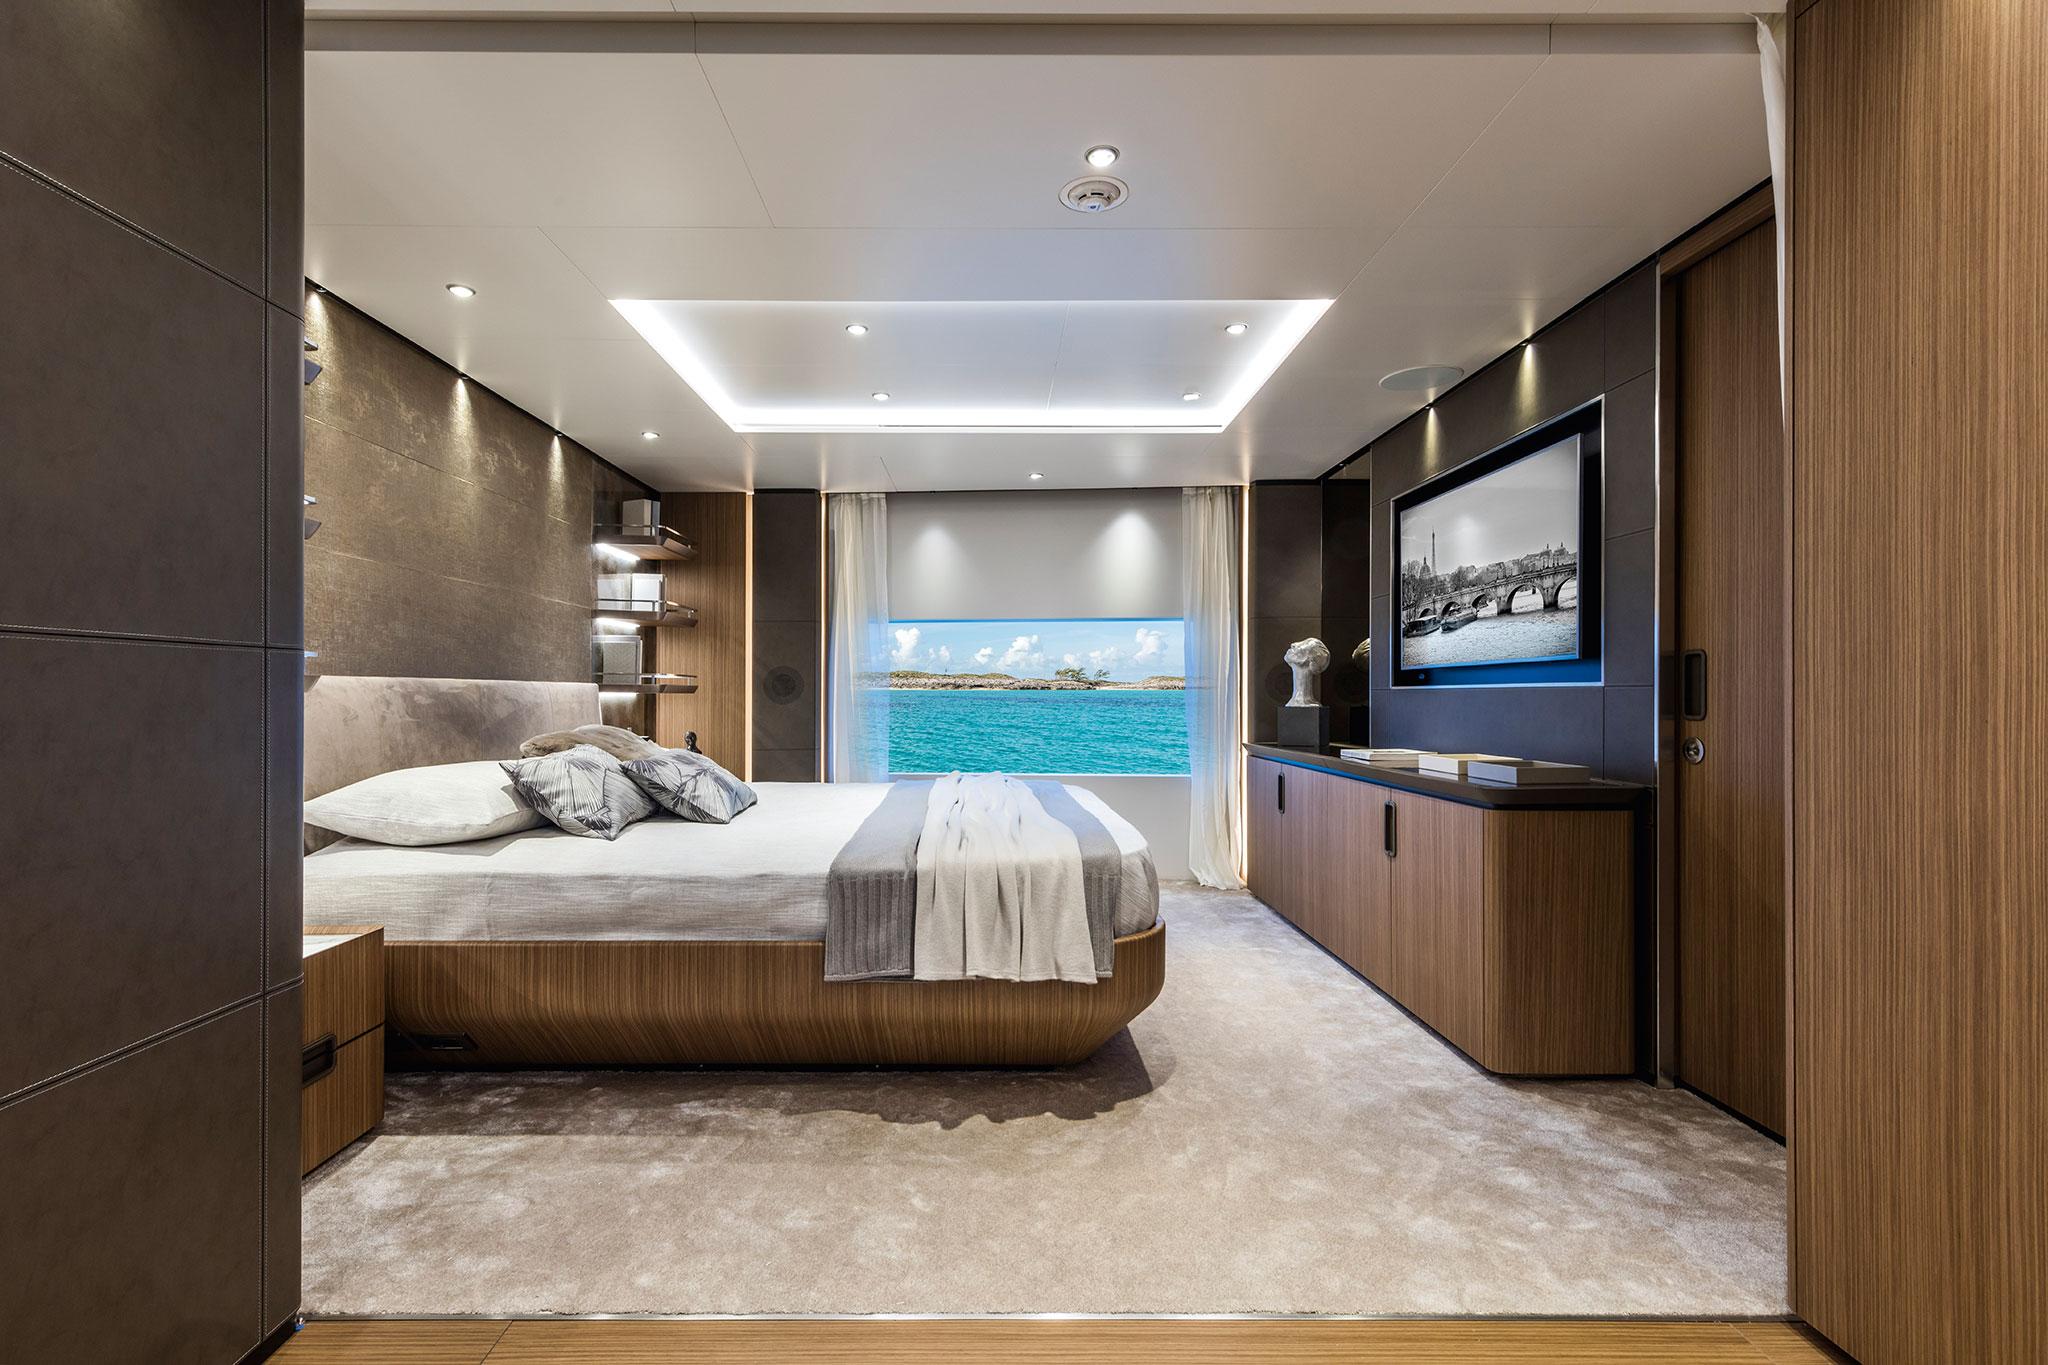 essai-Custom-line-120-yachts-france-170-10-155-corr3